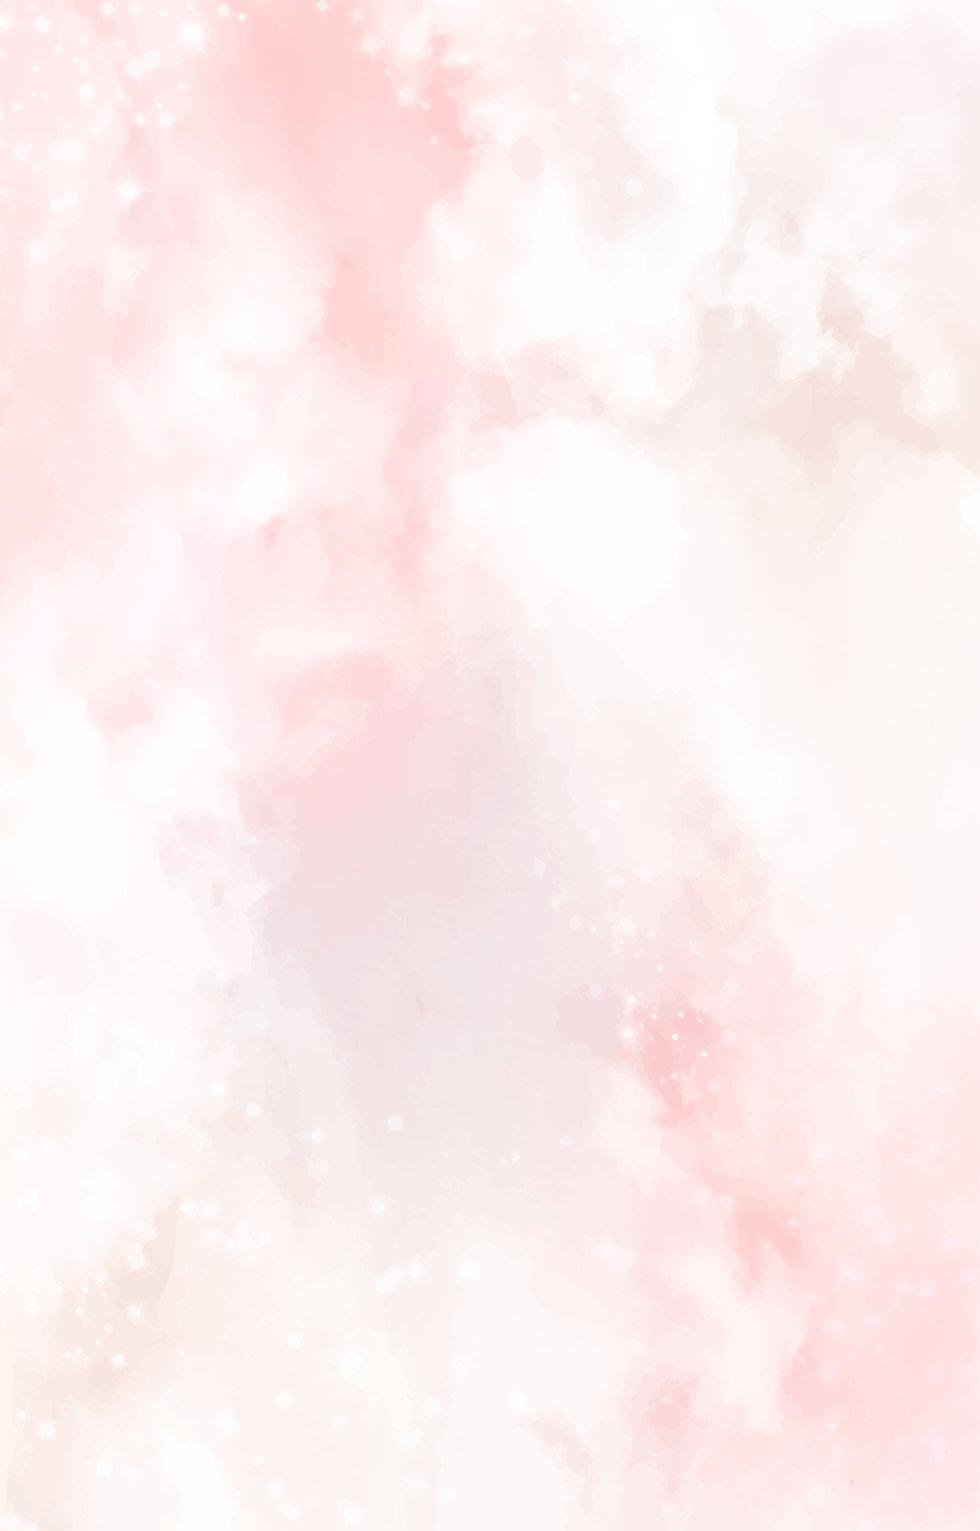 Background-5.jpg